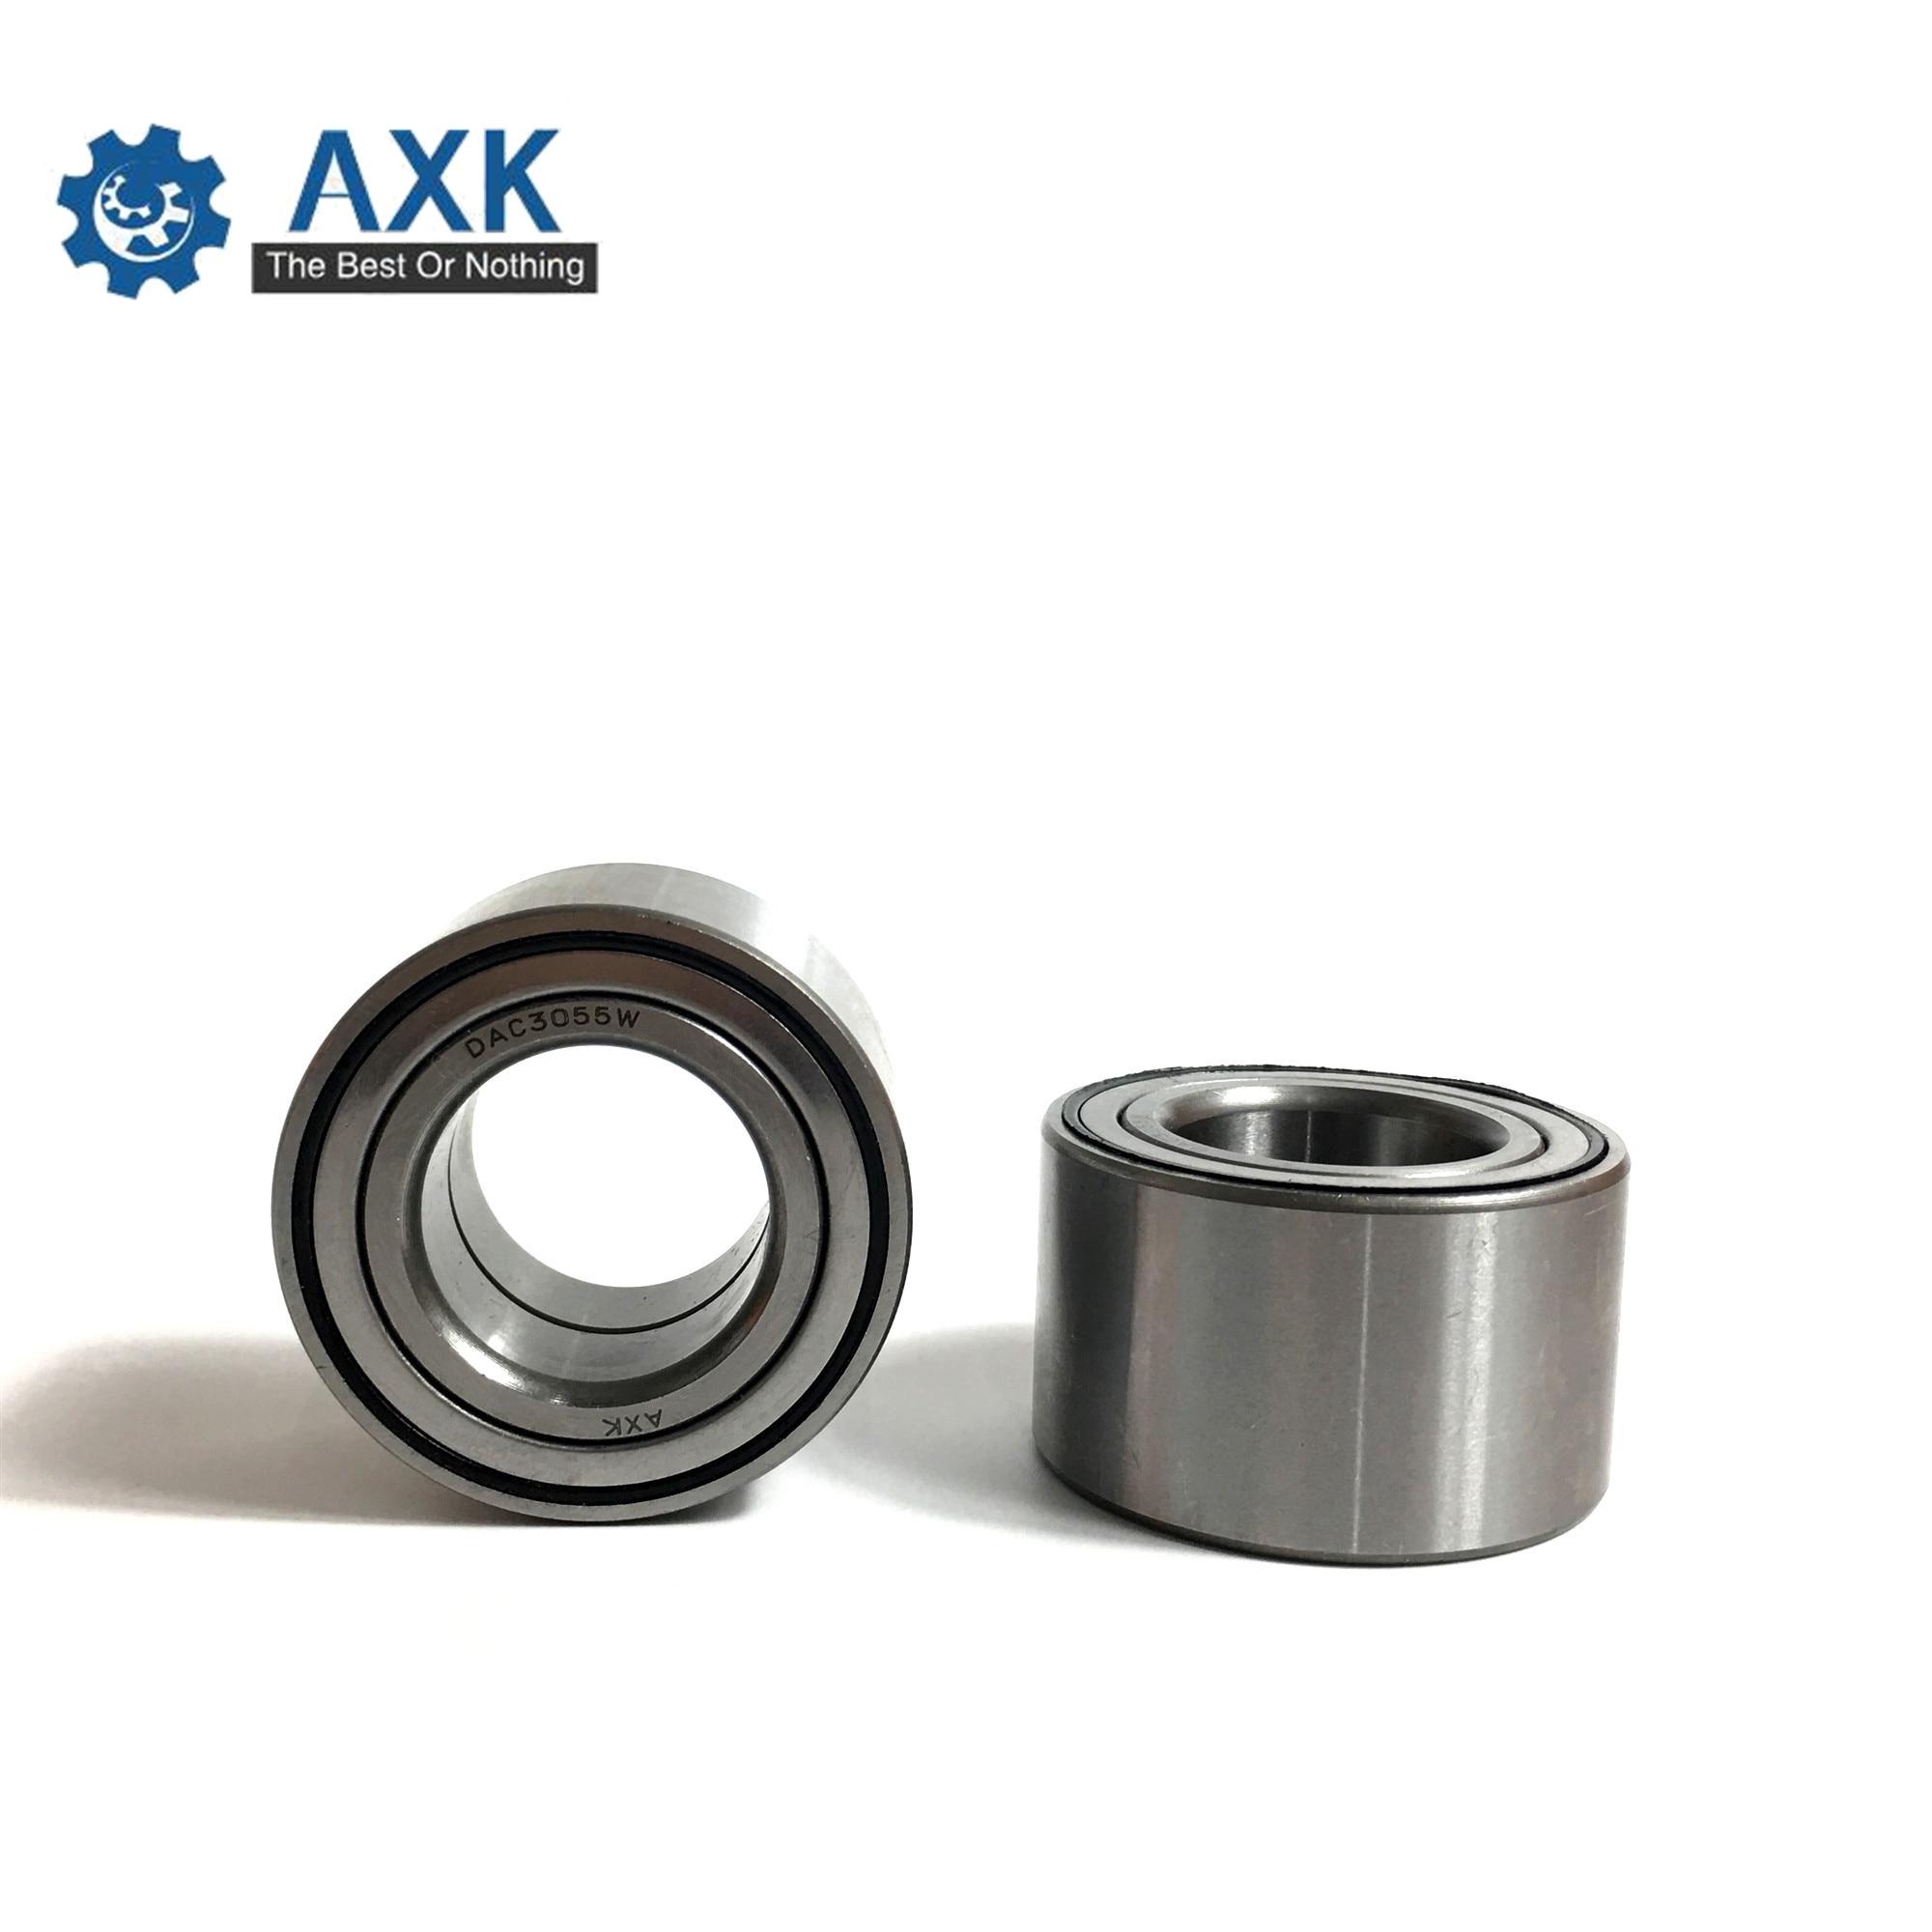 AXK  DAC3055W Bearings  Dac30550032 30x55x32mm Dac3055 Atv Utv Car Bearing Auto Wheel Hub Bearing Atv Wheel Bearing